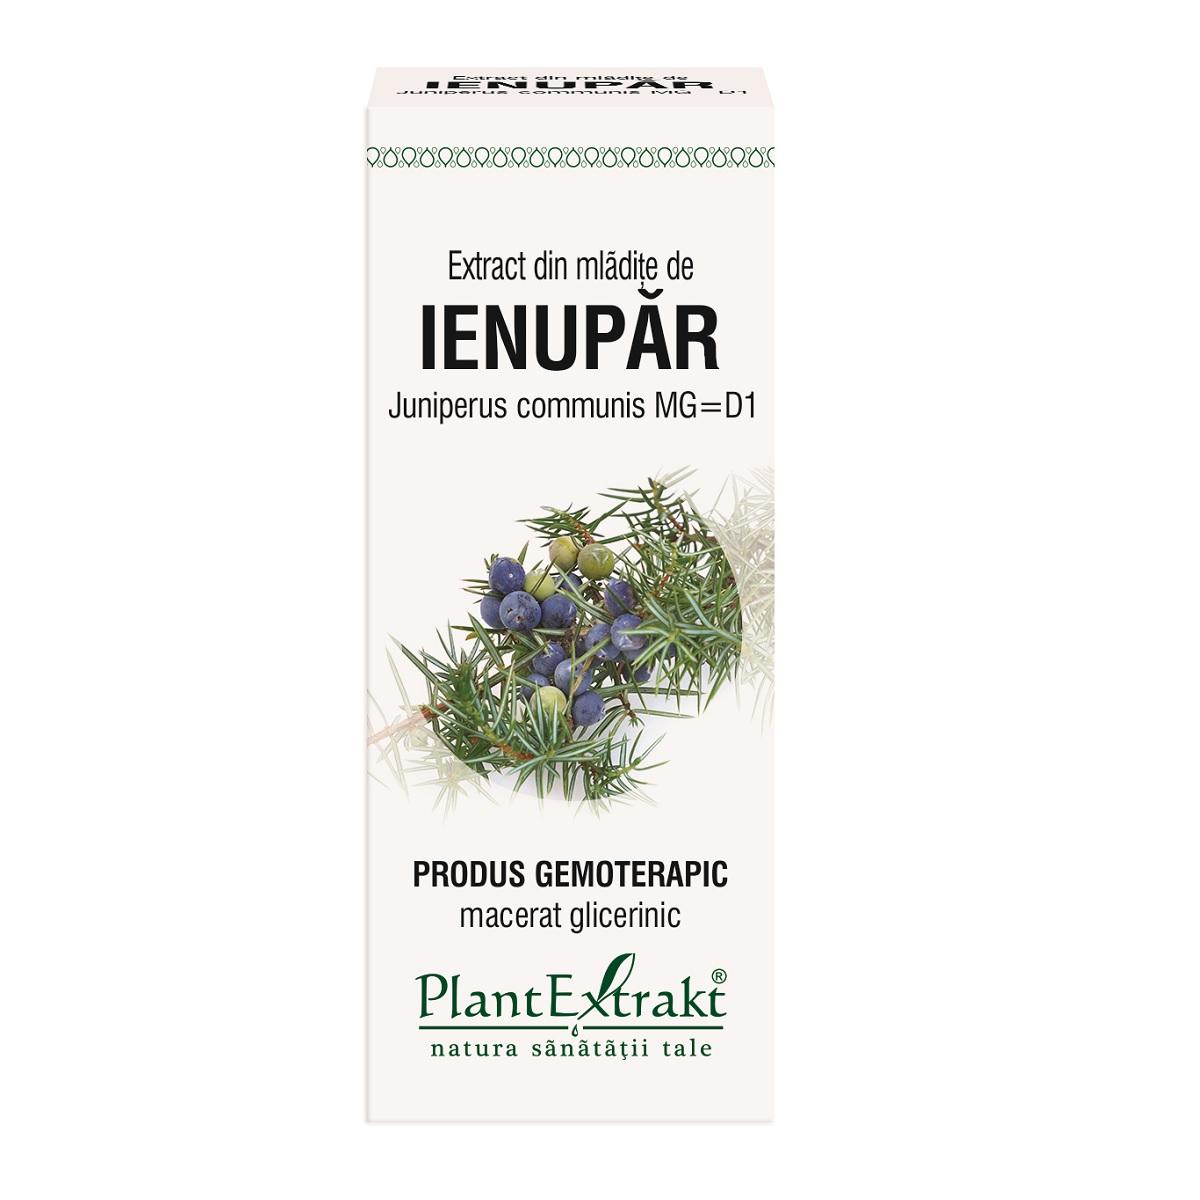 Extract din mladite de Ienupar, 50ml, PlantExtrakt drmax poza